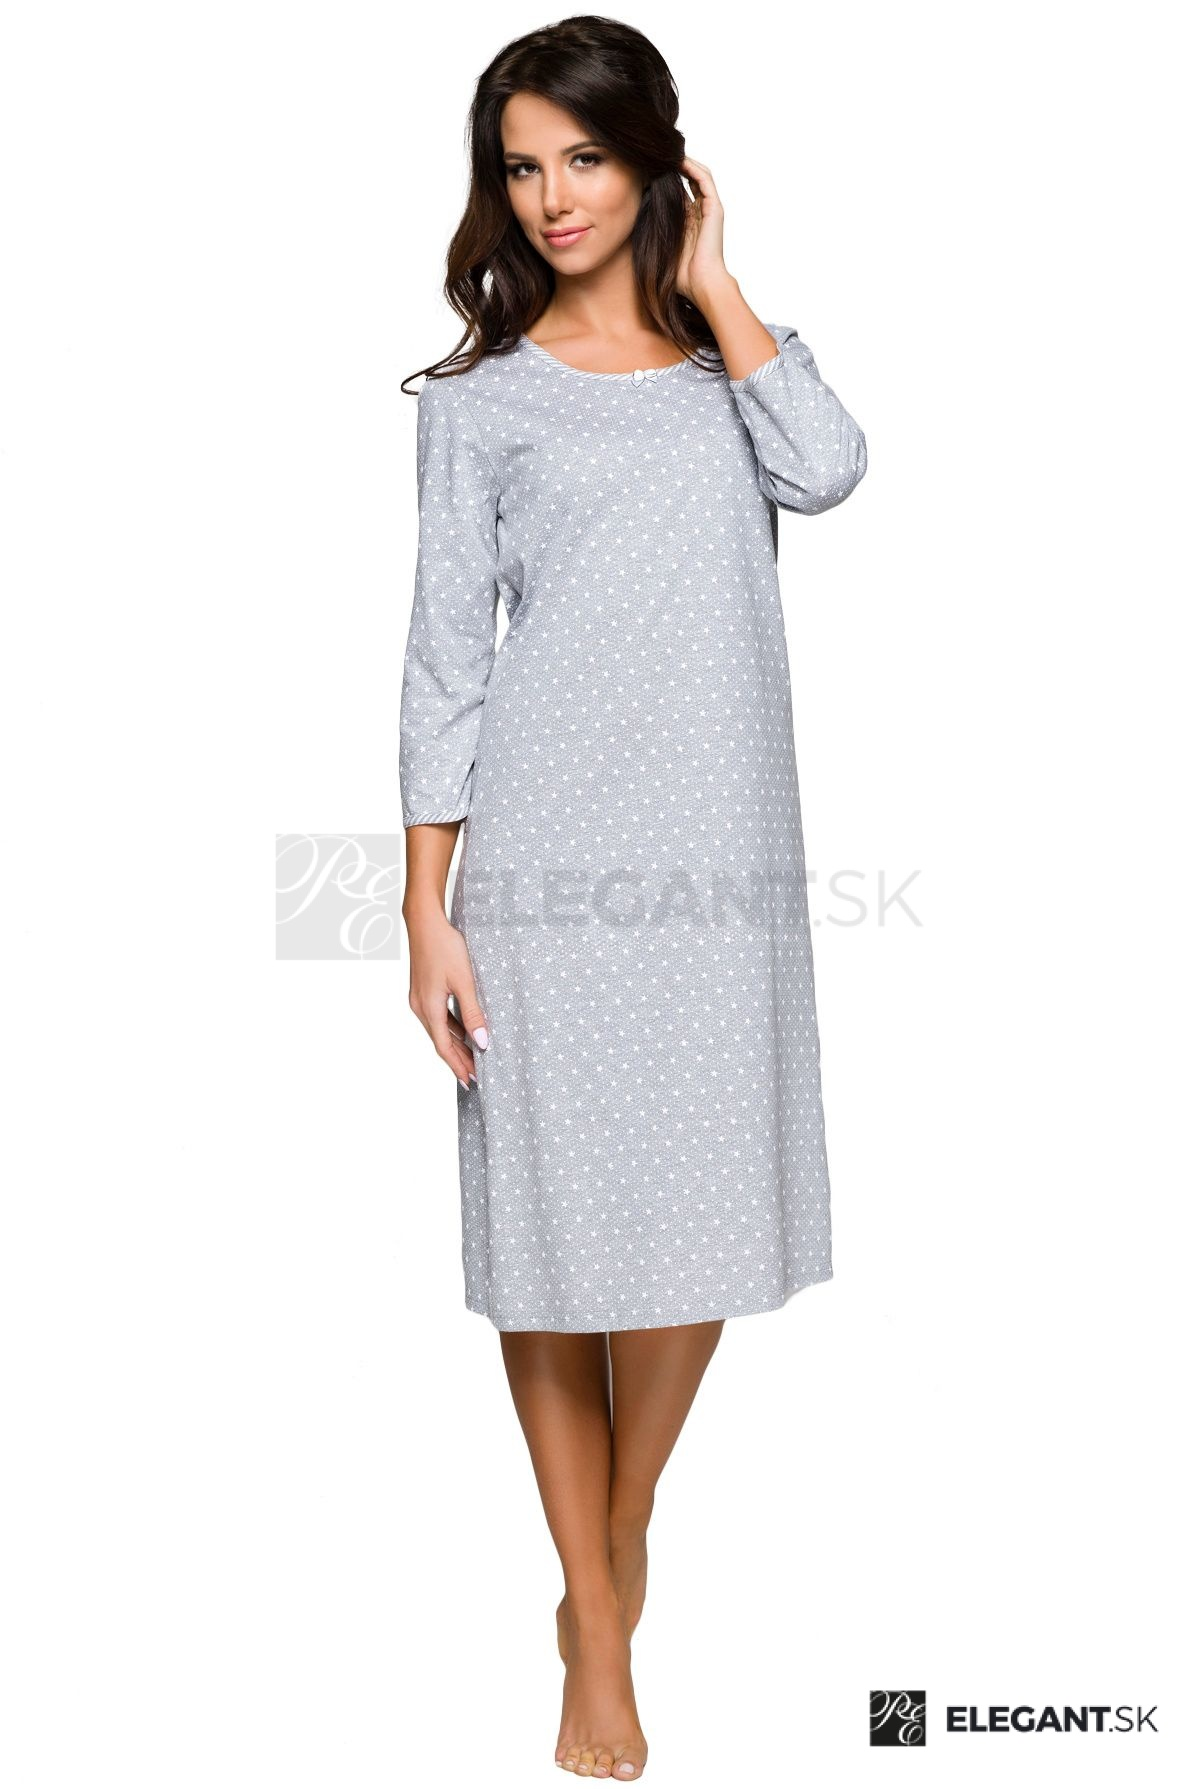 0c2dcc1e404b Nočná košeľa Ilona sivá s hviezdičkami - ELEGANT.sk